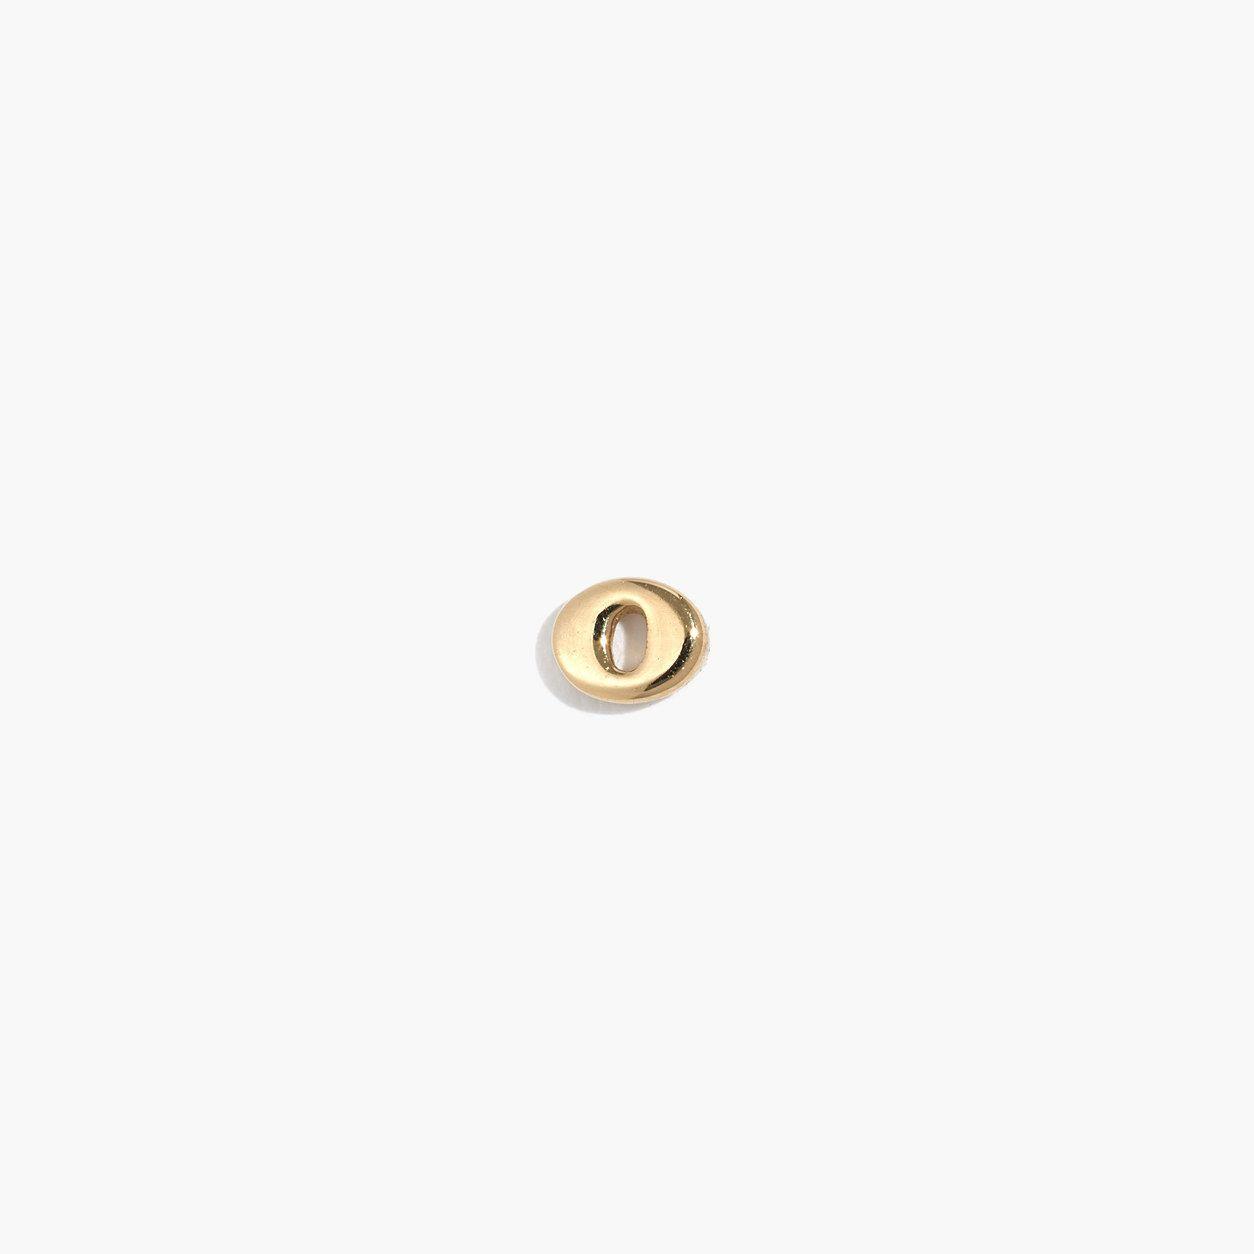 Madewell Womens Vermeil Single Letter Stud Earring